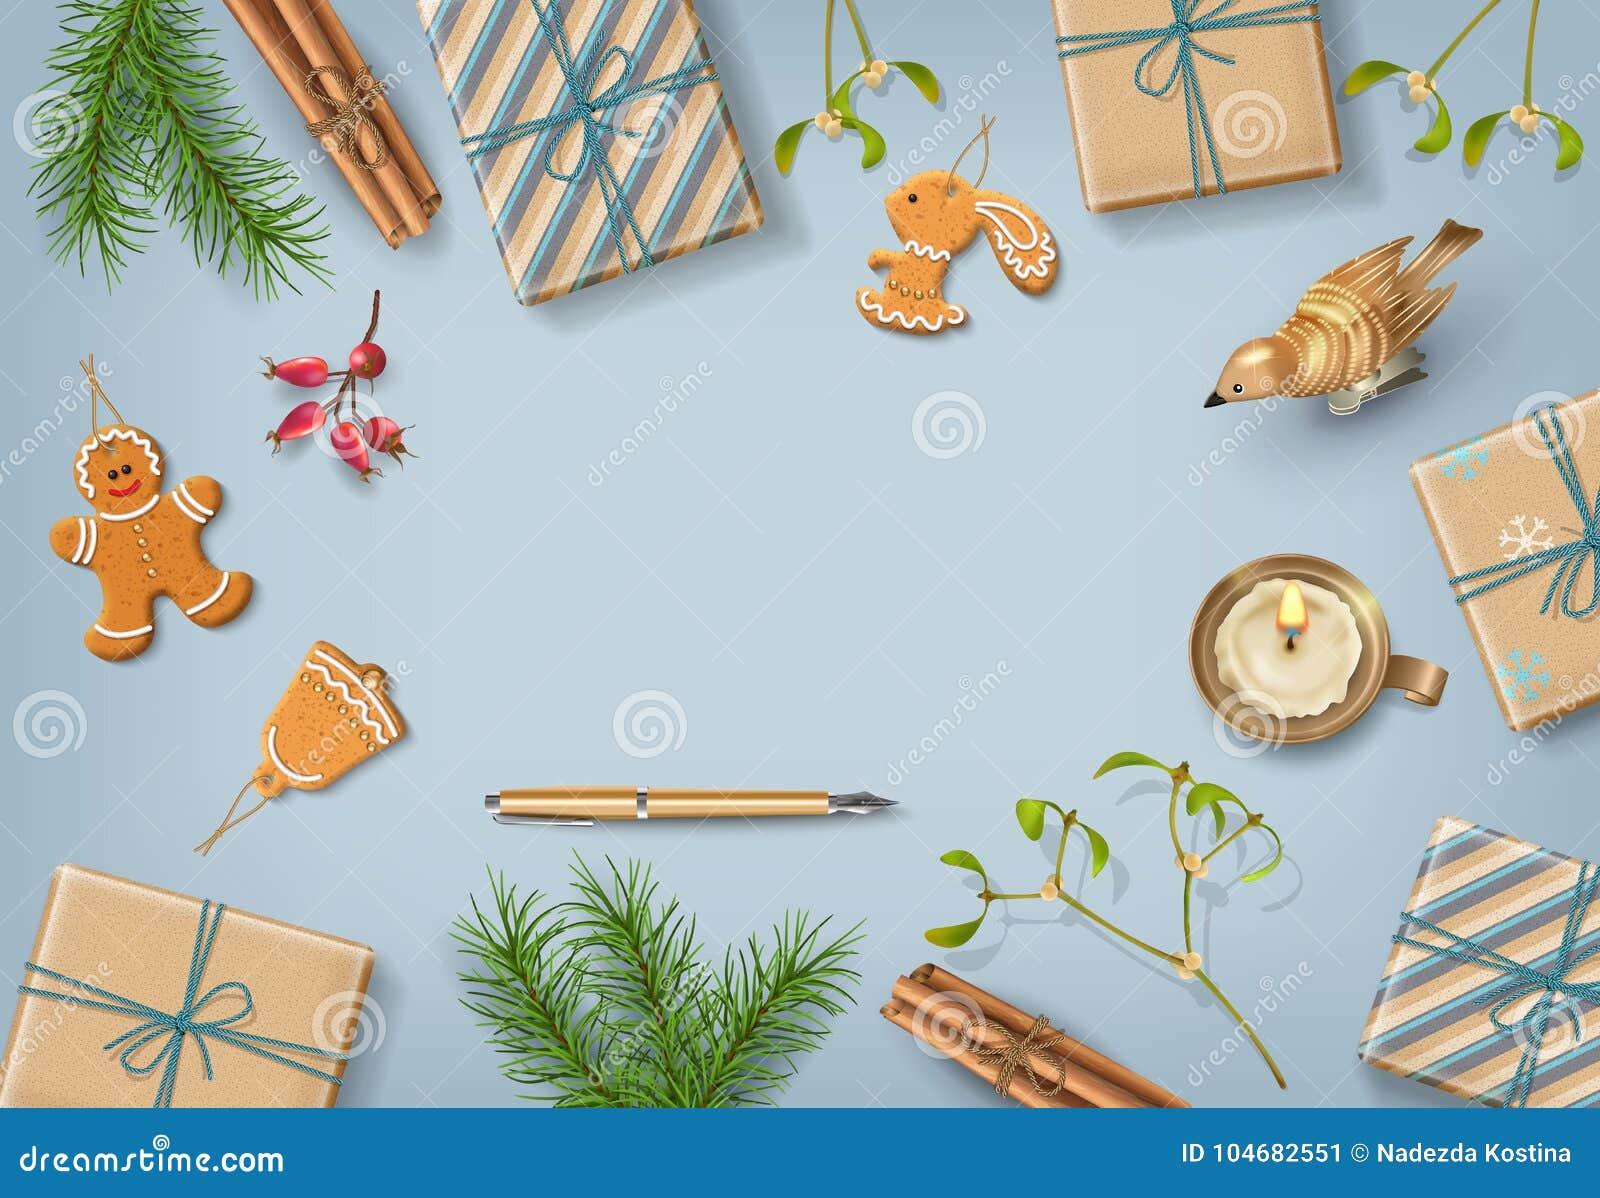 Christmas flat lay design